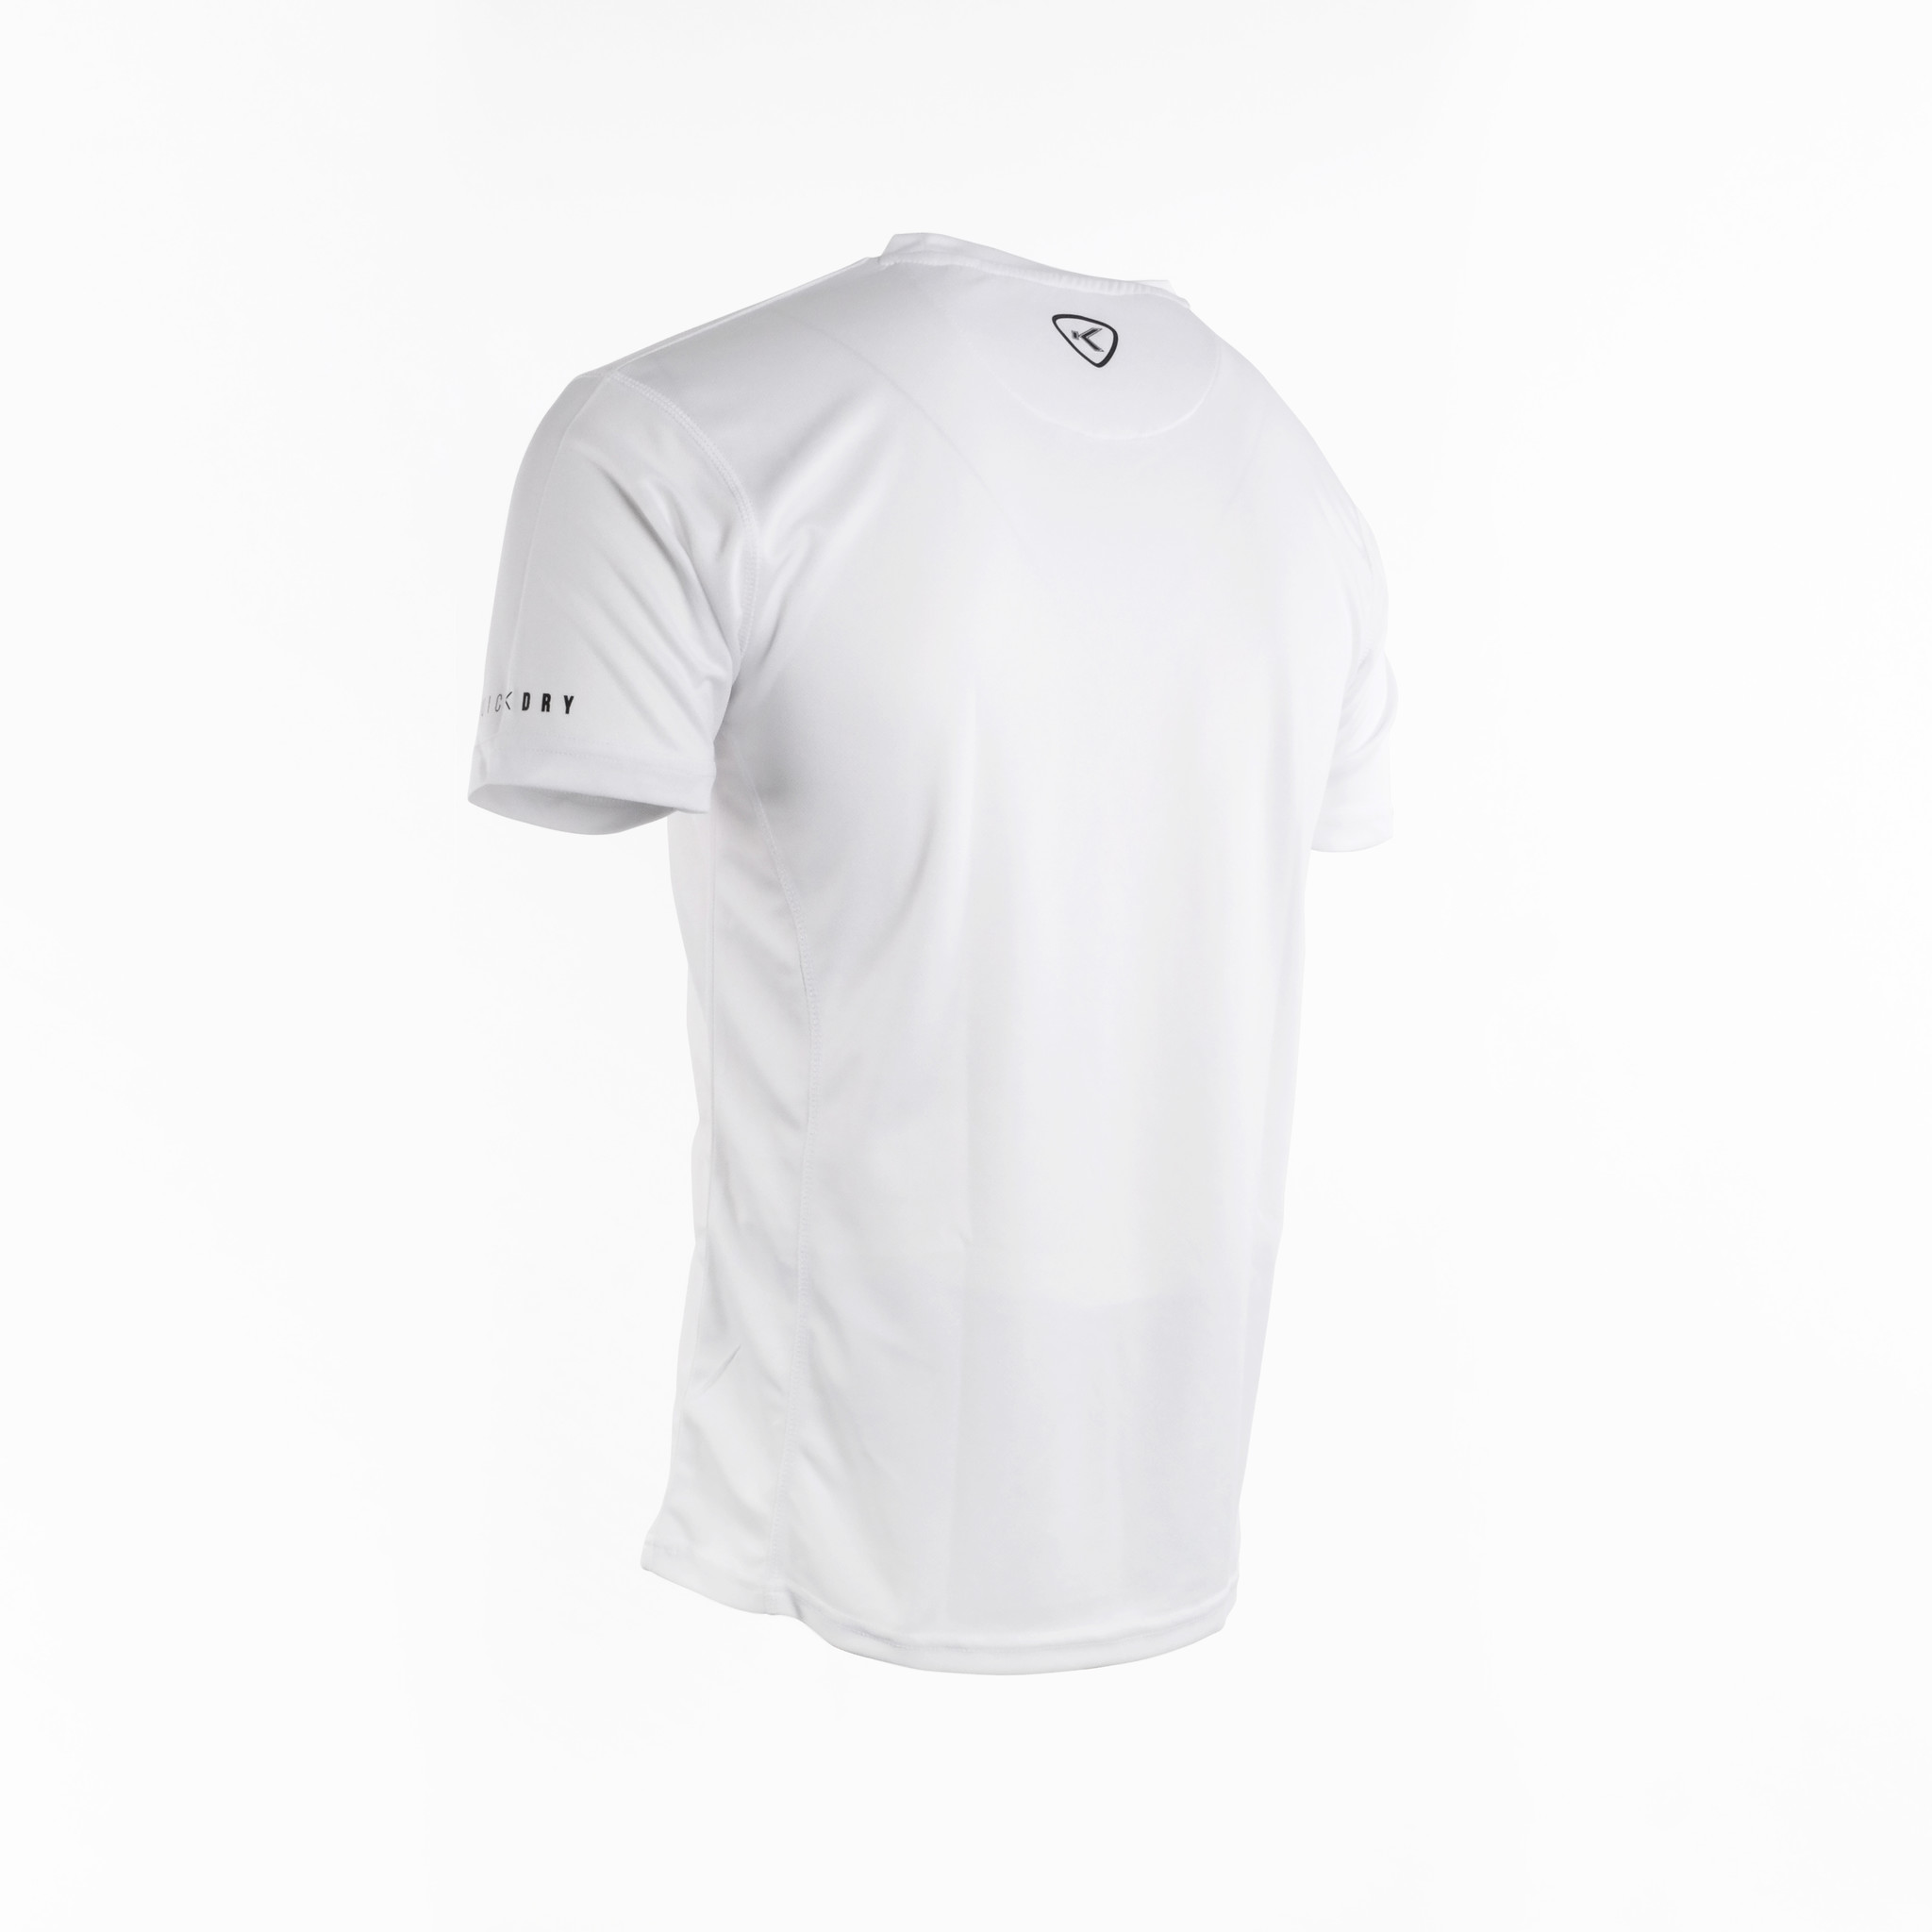 Klupp Original Shirt - Wit